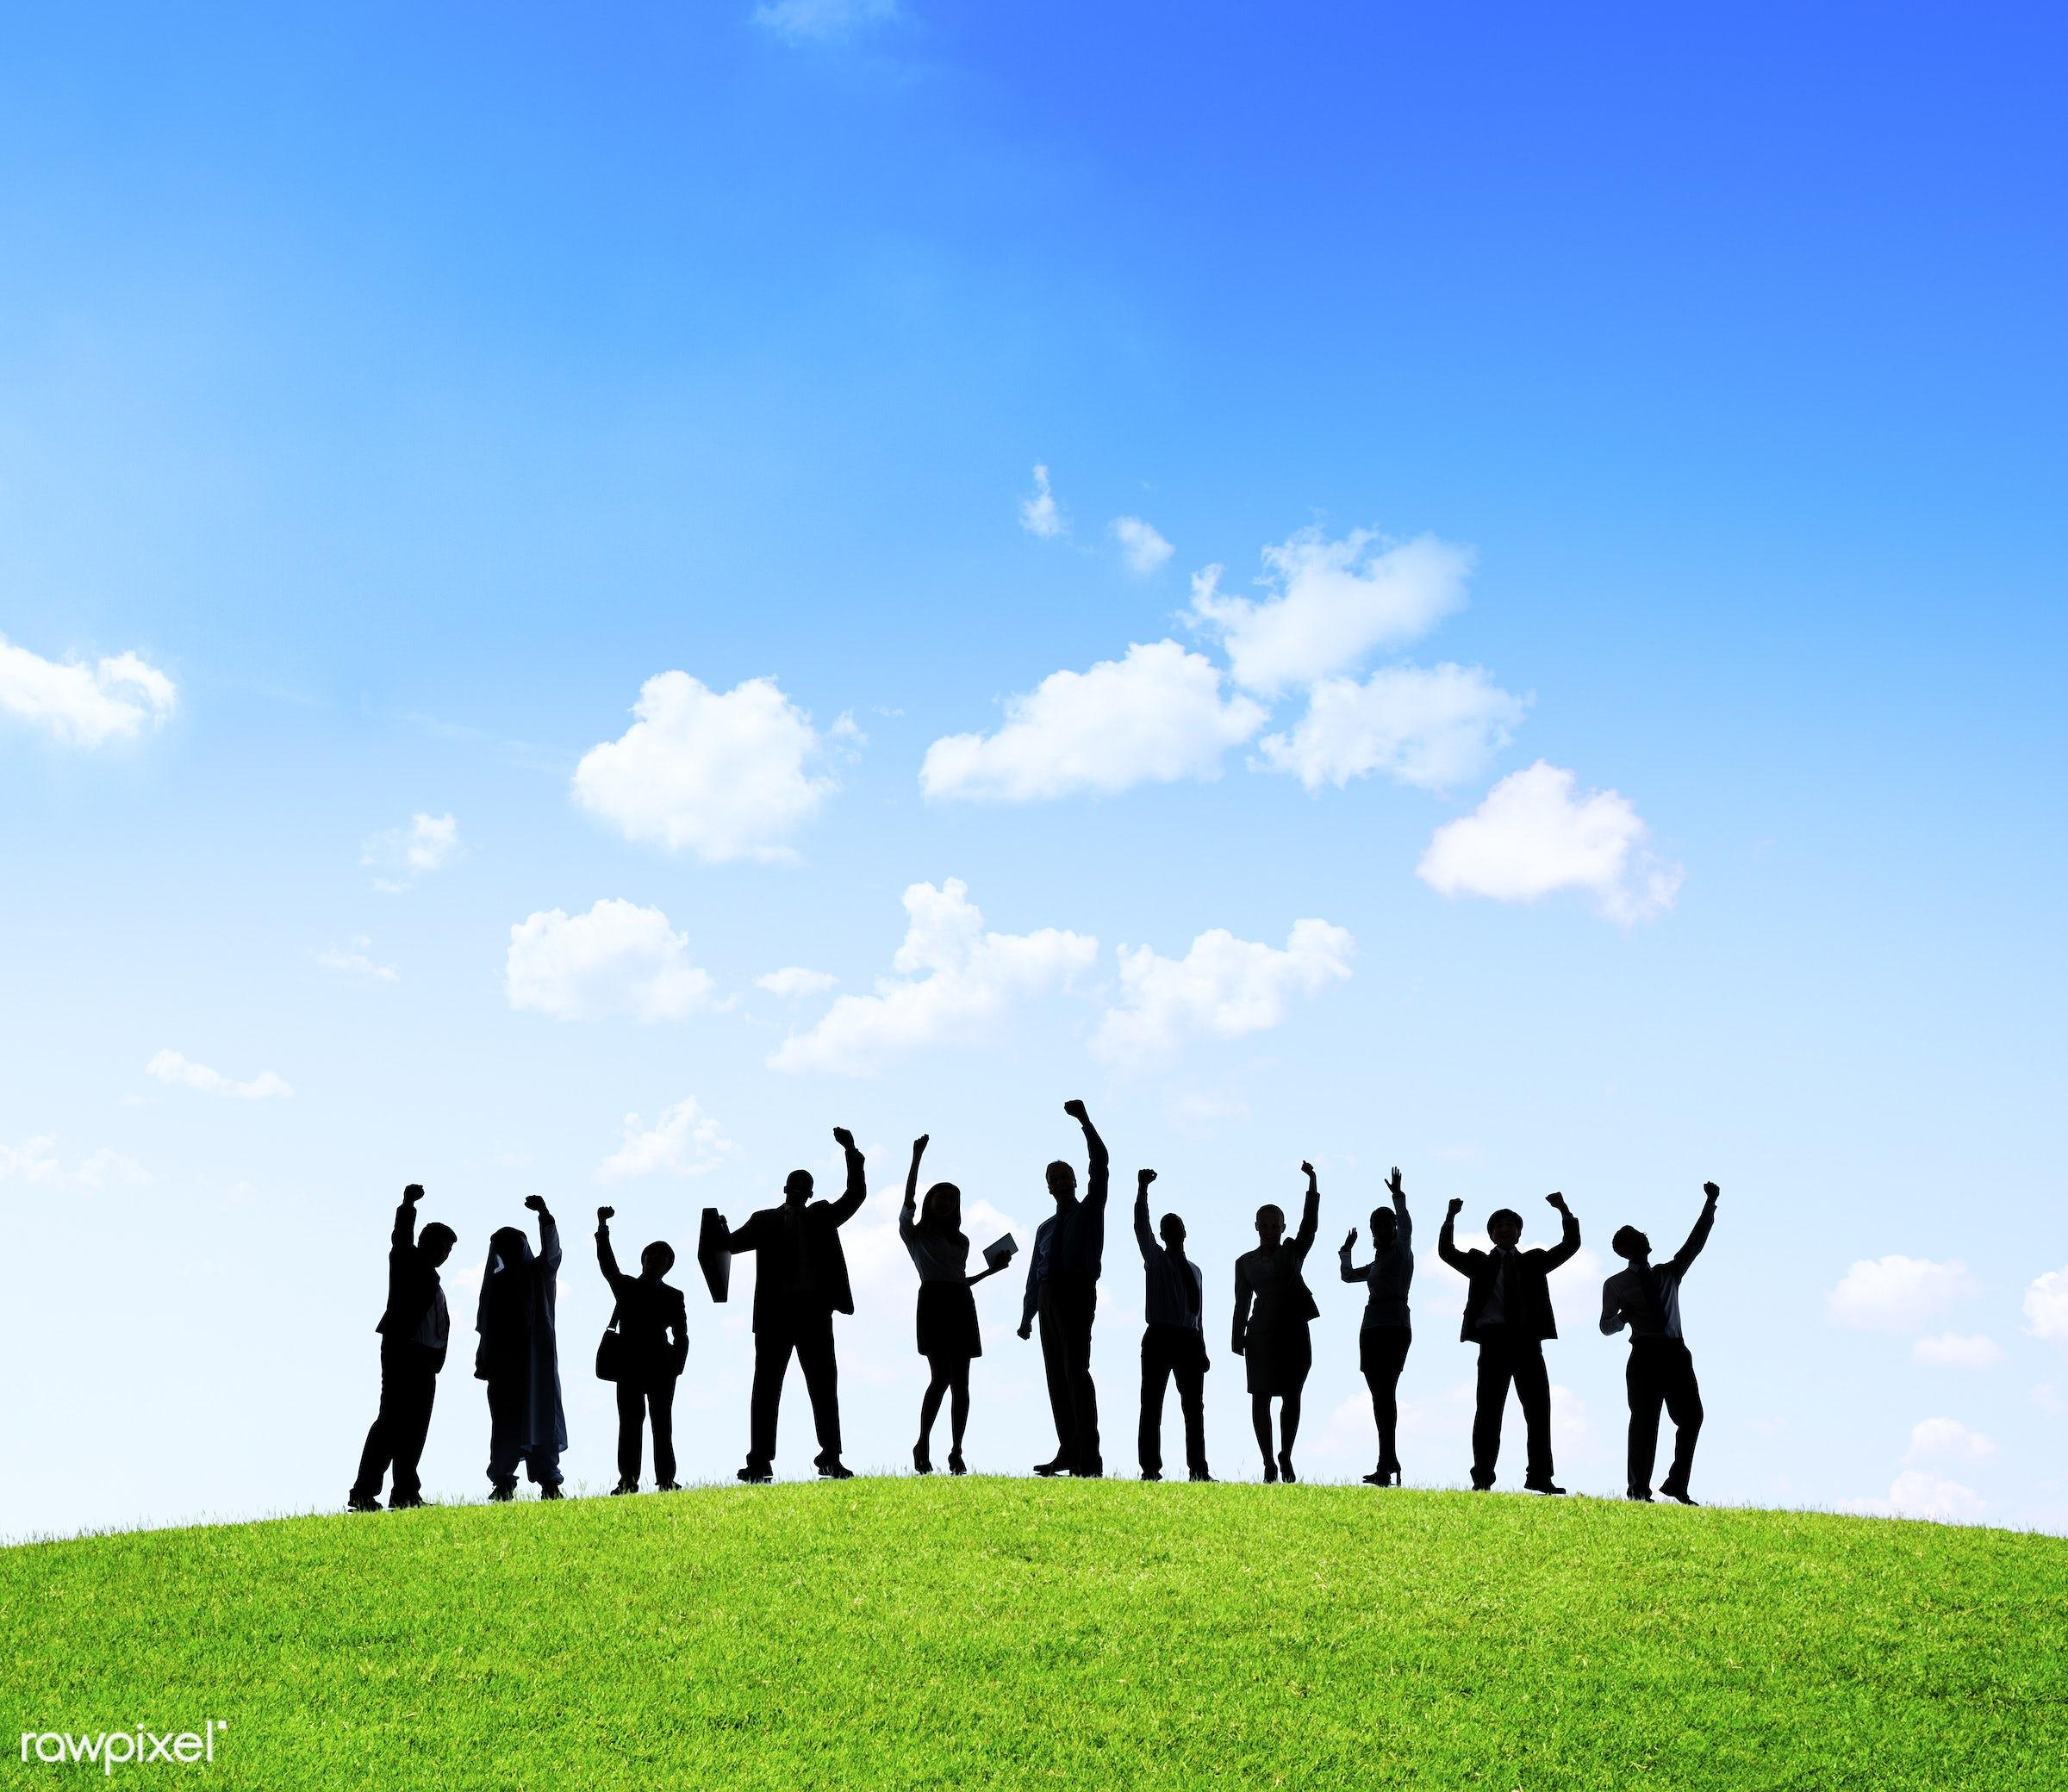 african descent, asian ethnicity, aspiration, business, business people, businessmen, businesswomen, cheerful, communication...